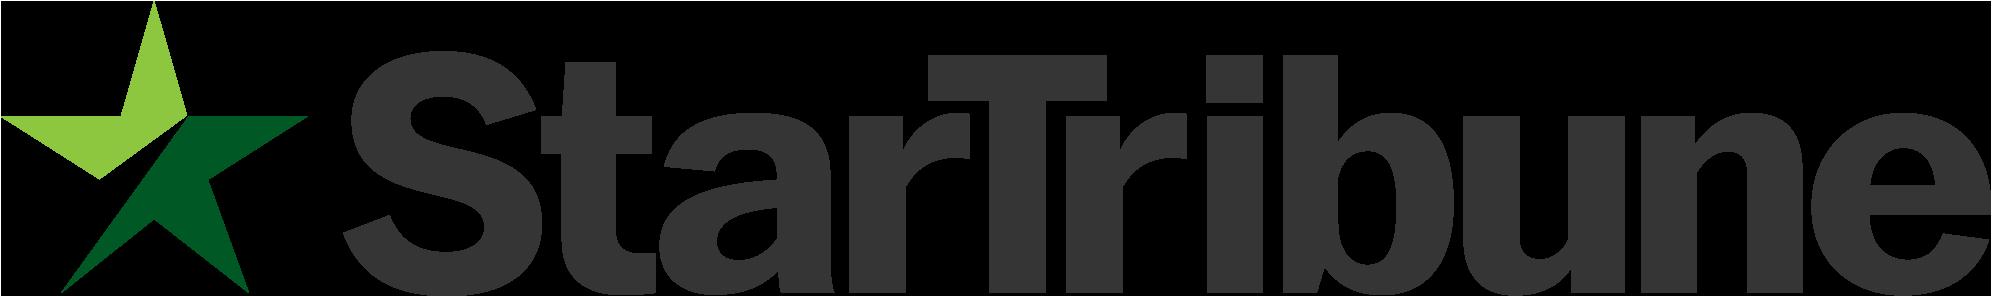 Crocus Hill Partners. Beth Lilly. Star Tribune.